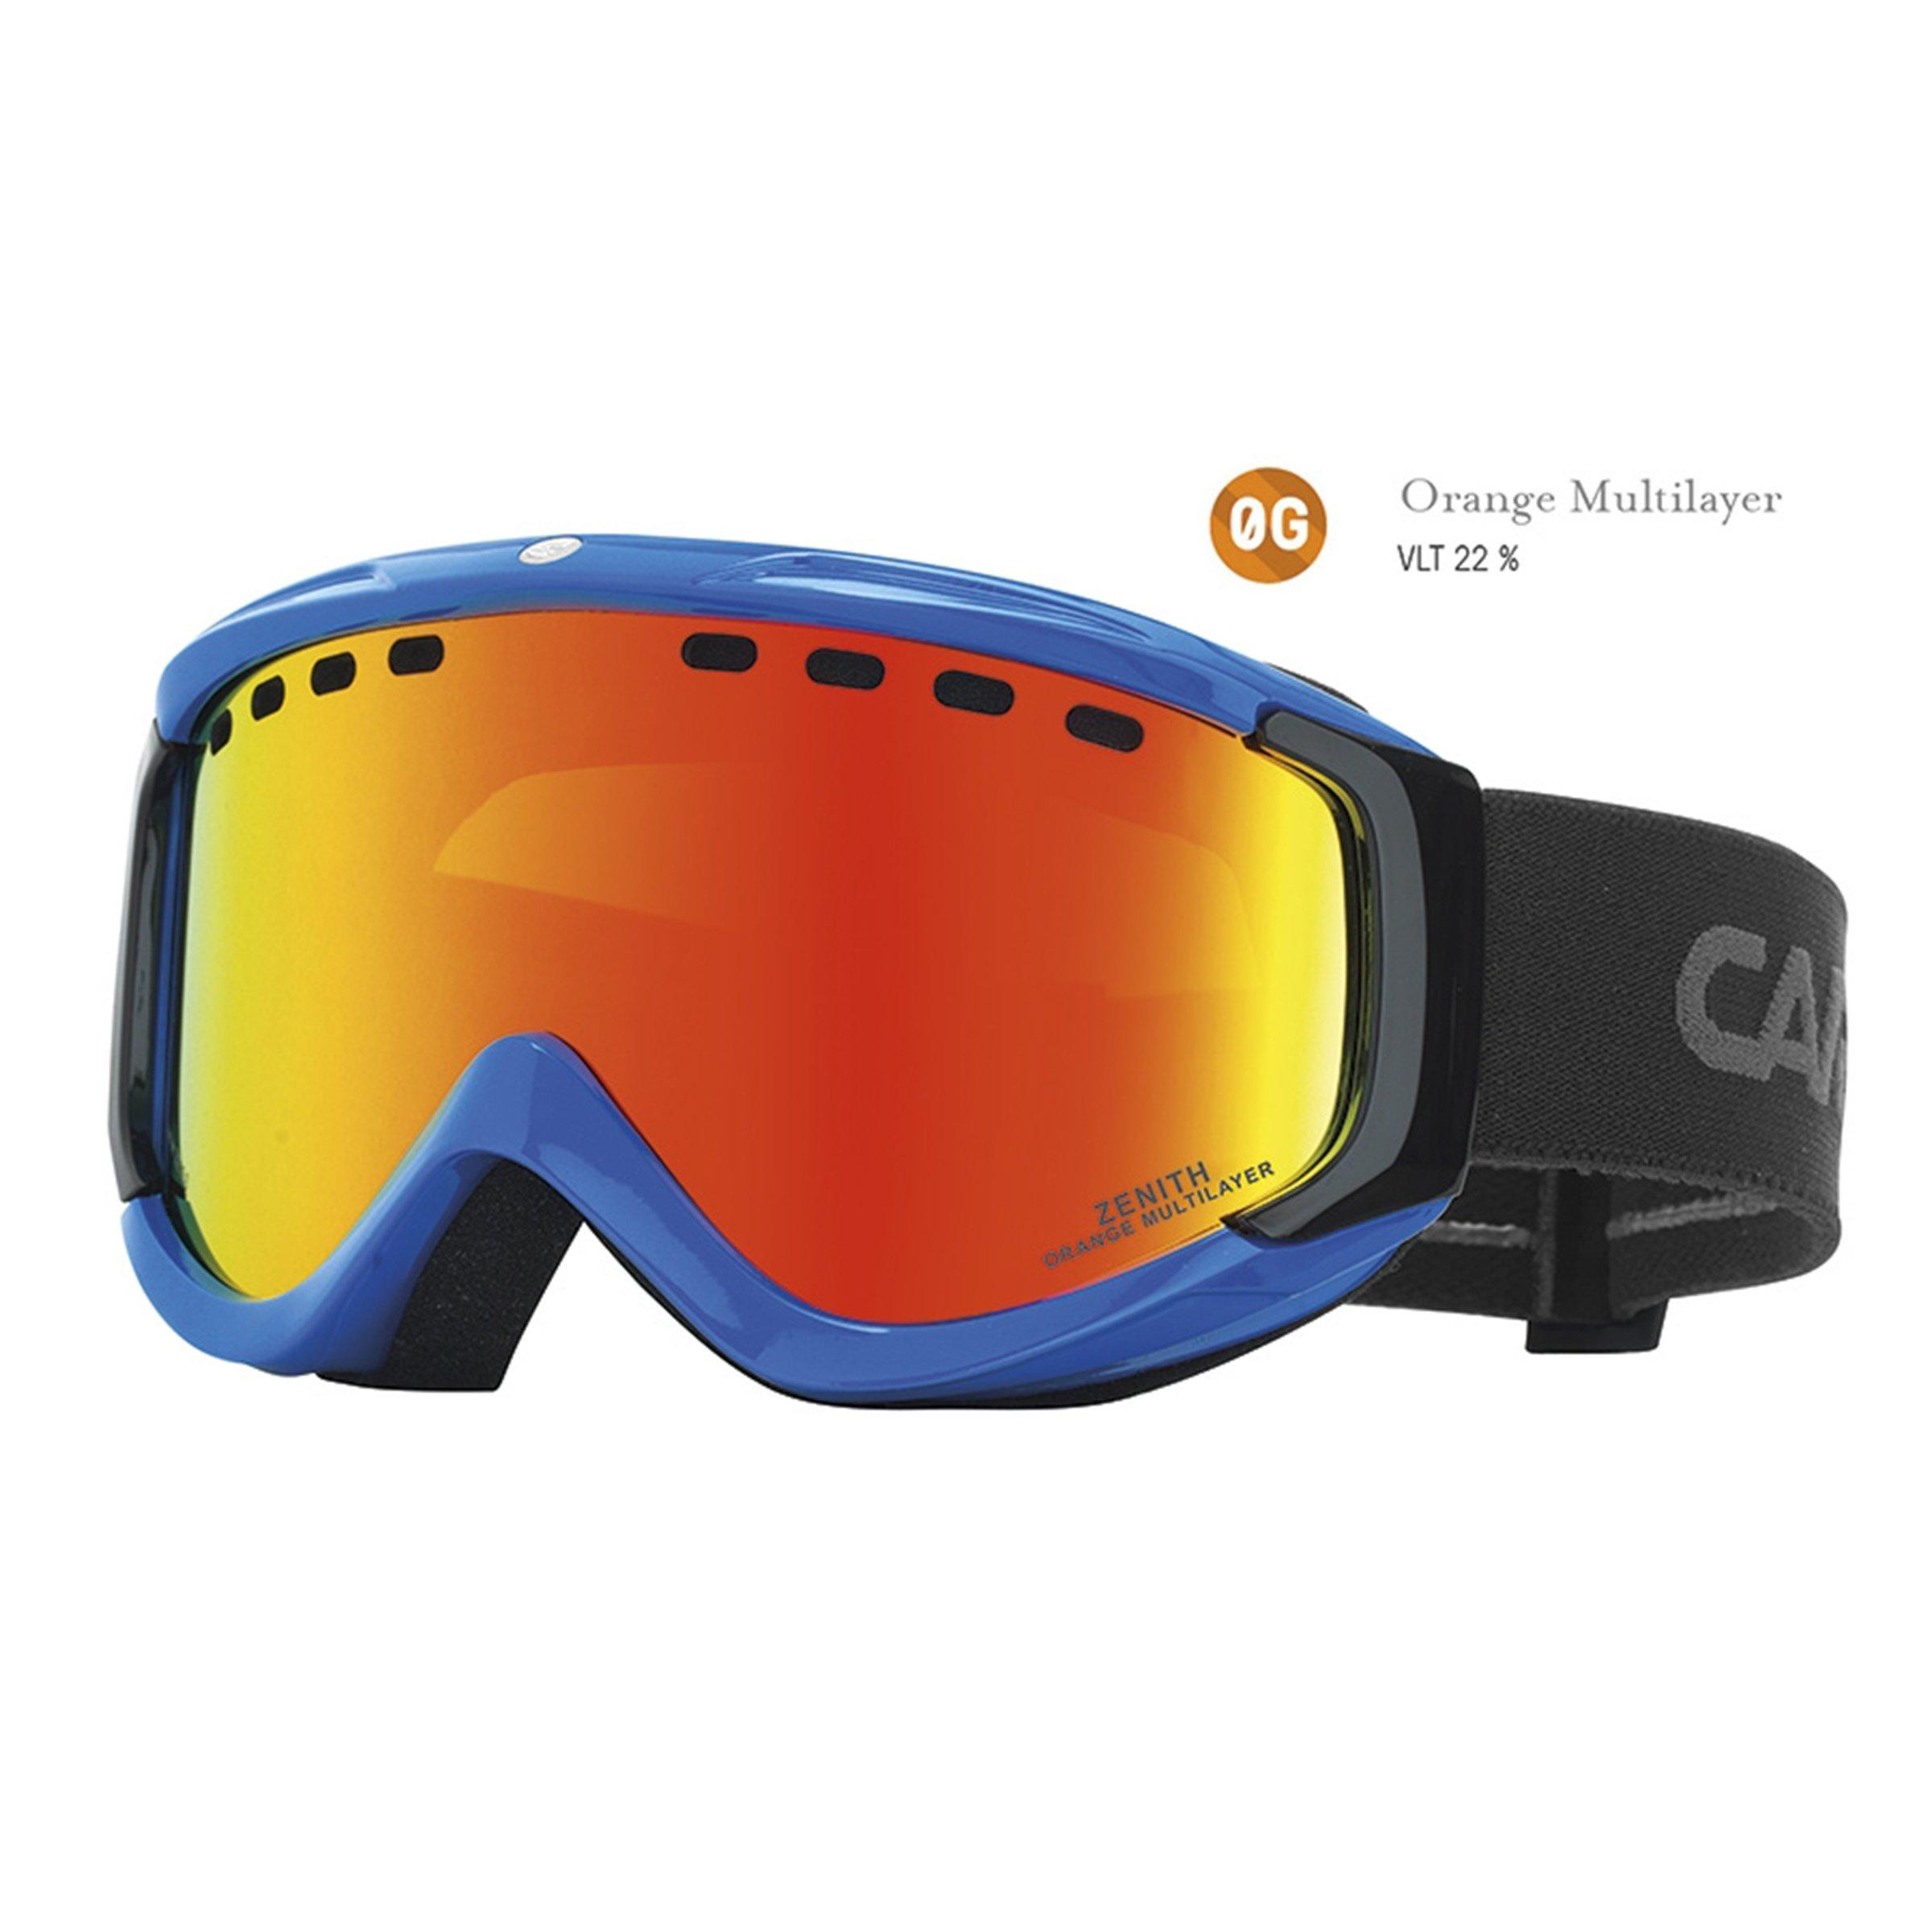 Carrera Zenith (filtr: orange multilayer) 16/17